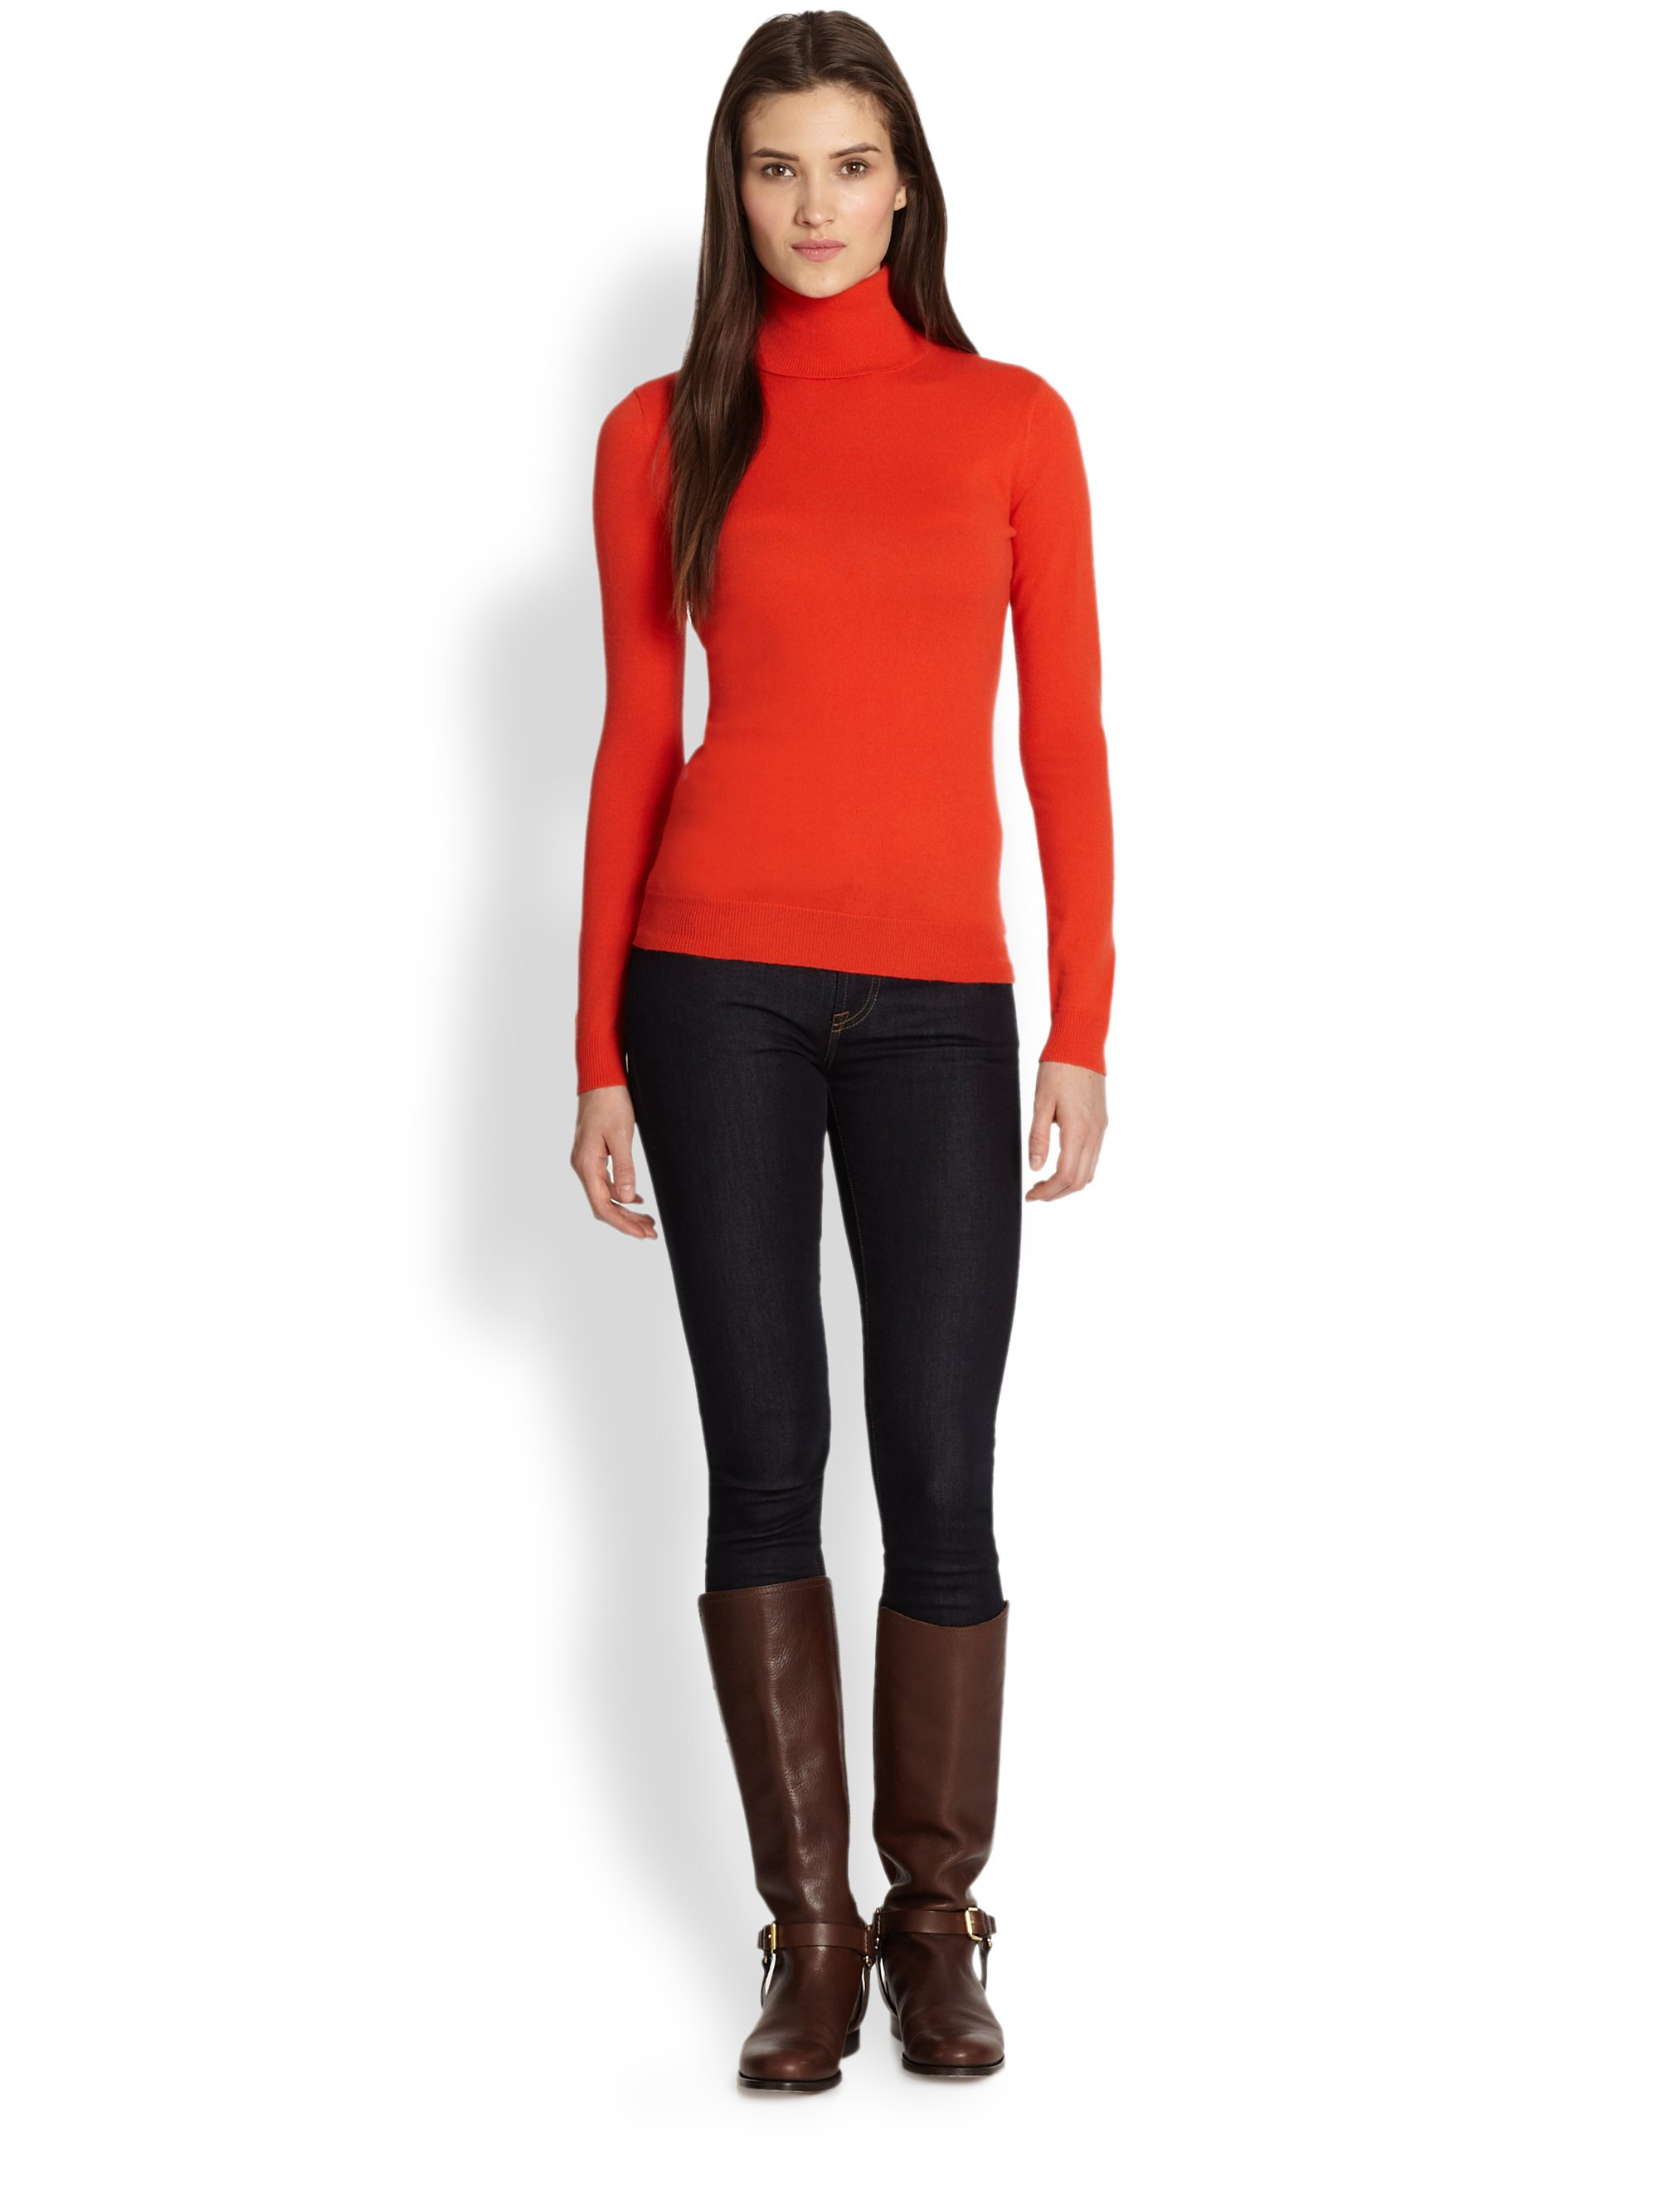 Ralph lauren black label Cashmere Turtleneck Sweater in Red | Lyst